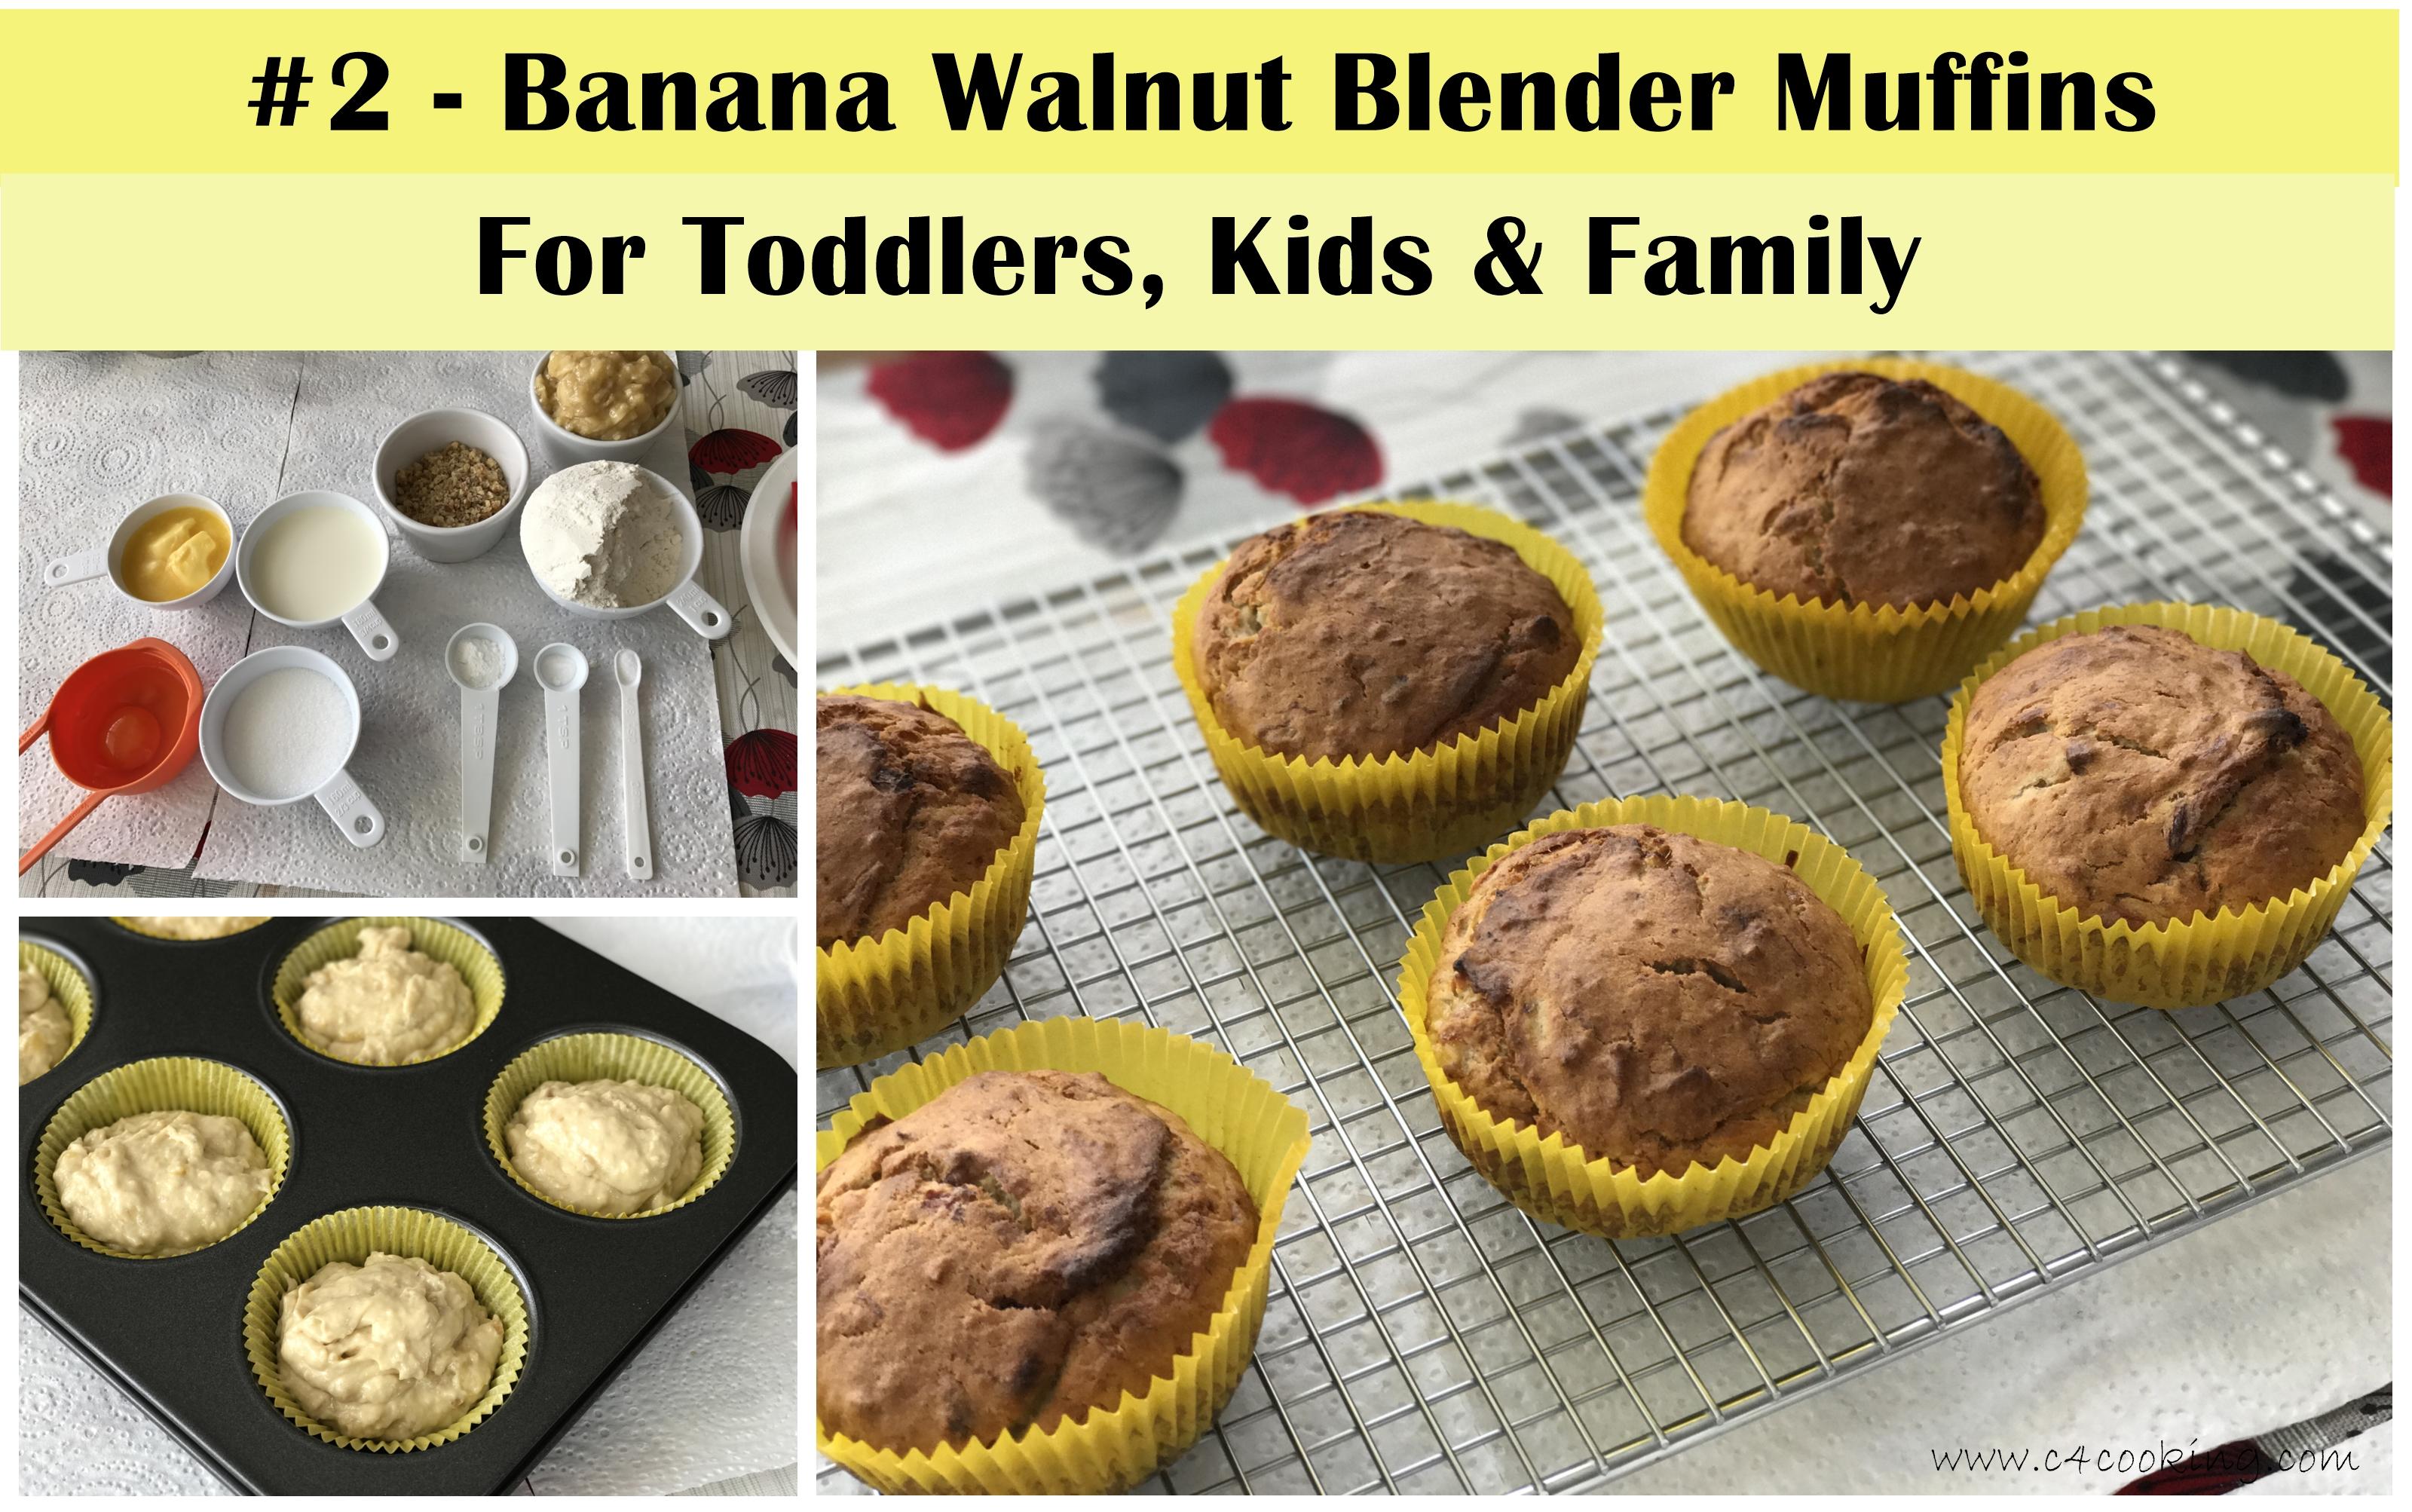 Banana Walnut Blender muffins